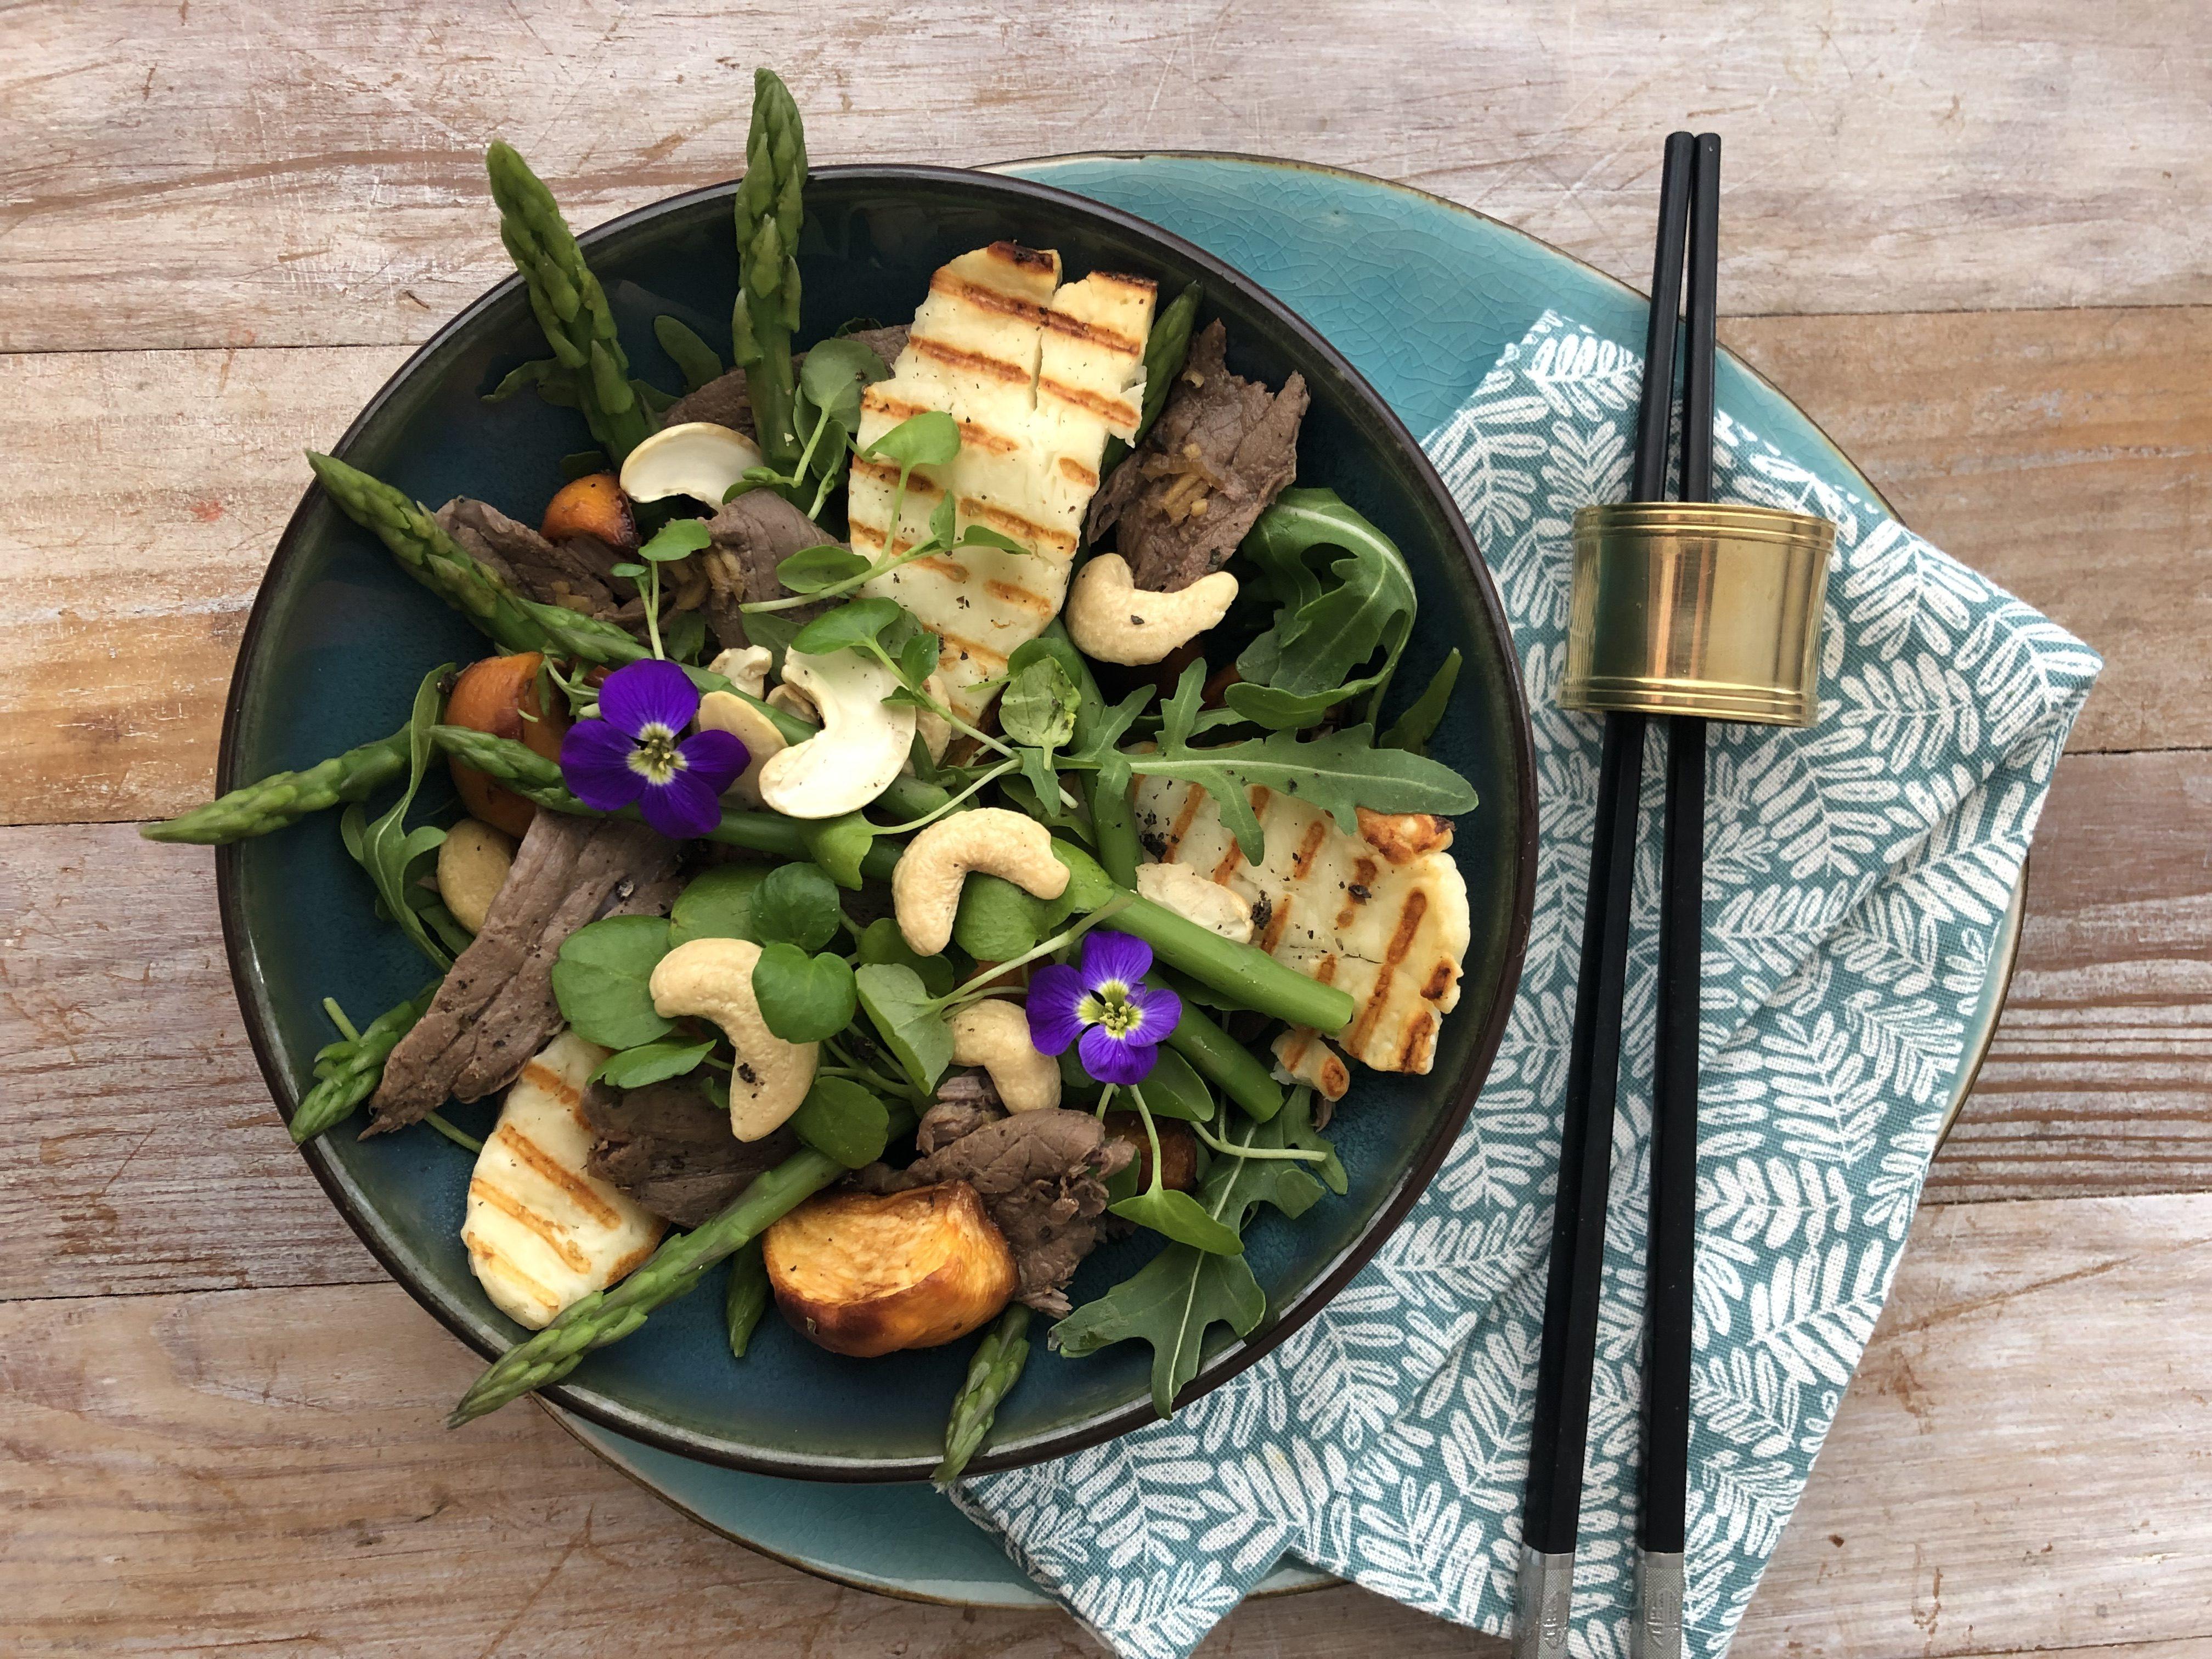 Salade printanière au boeuf mariné, asperge et navet rôtis